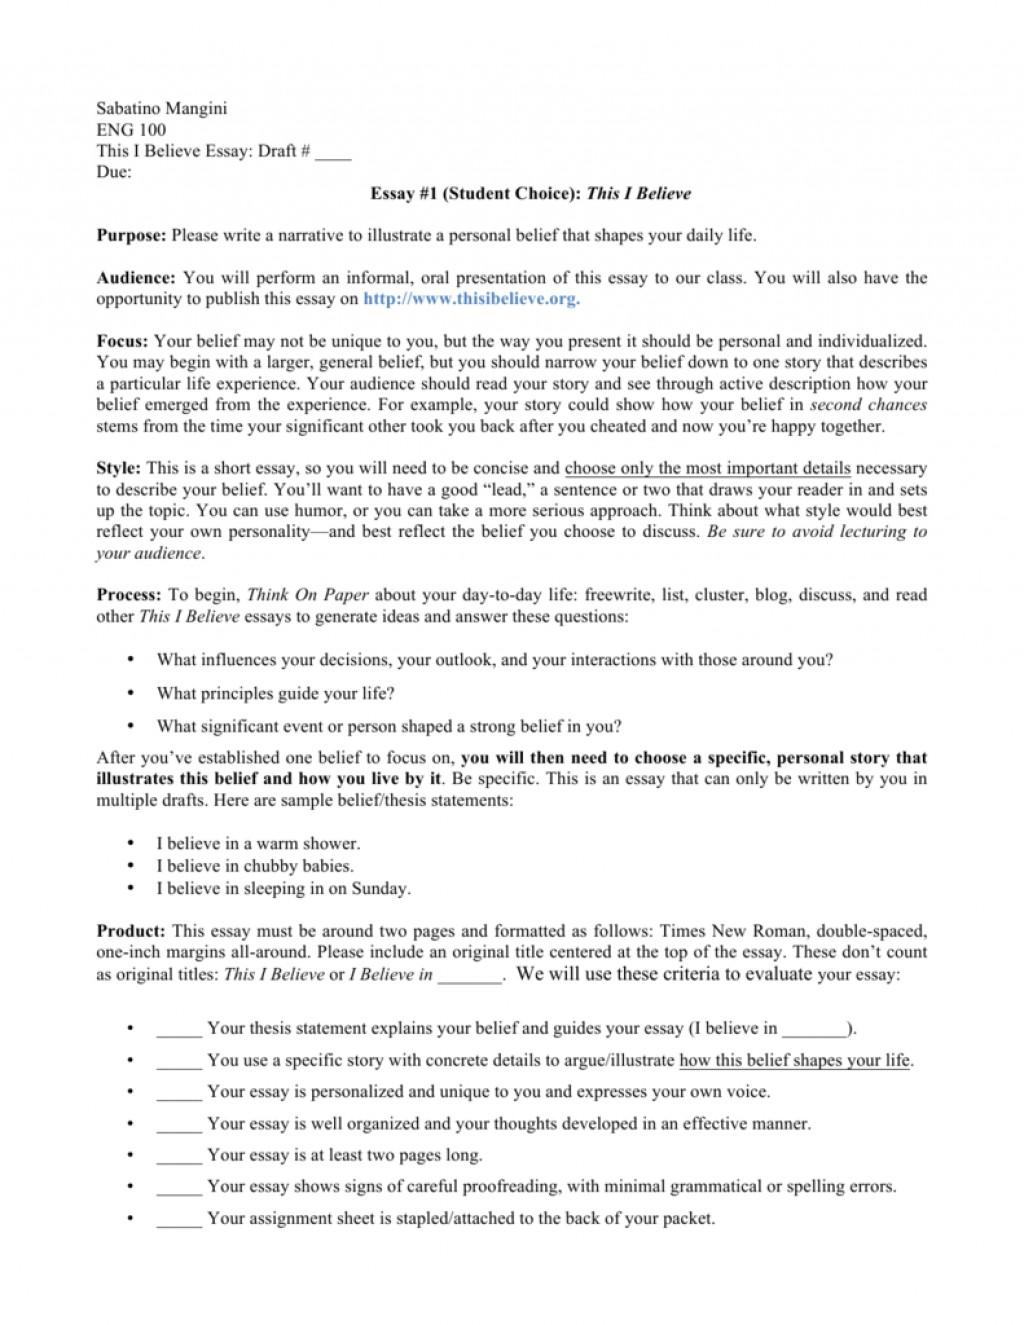 008 This I Believe Essays 008807227 1 Stupendous Essay Examples Npr College Large